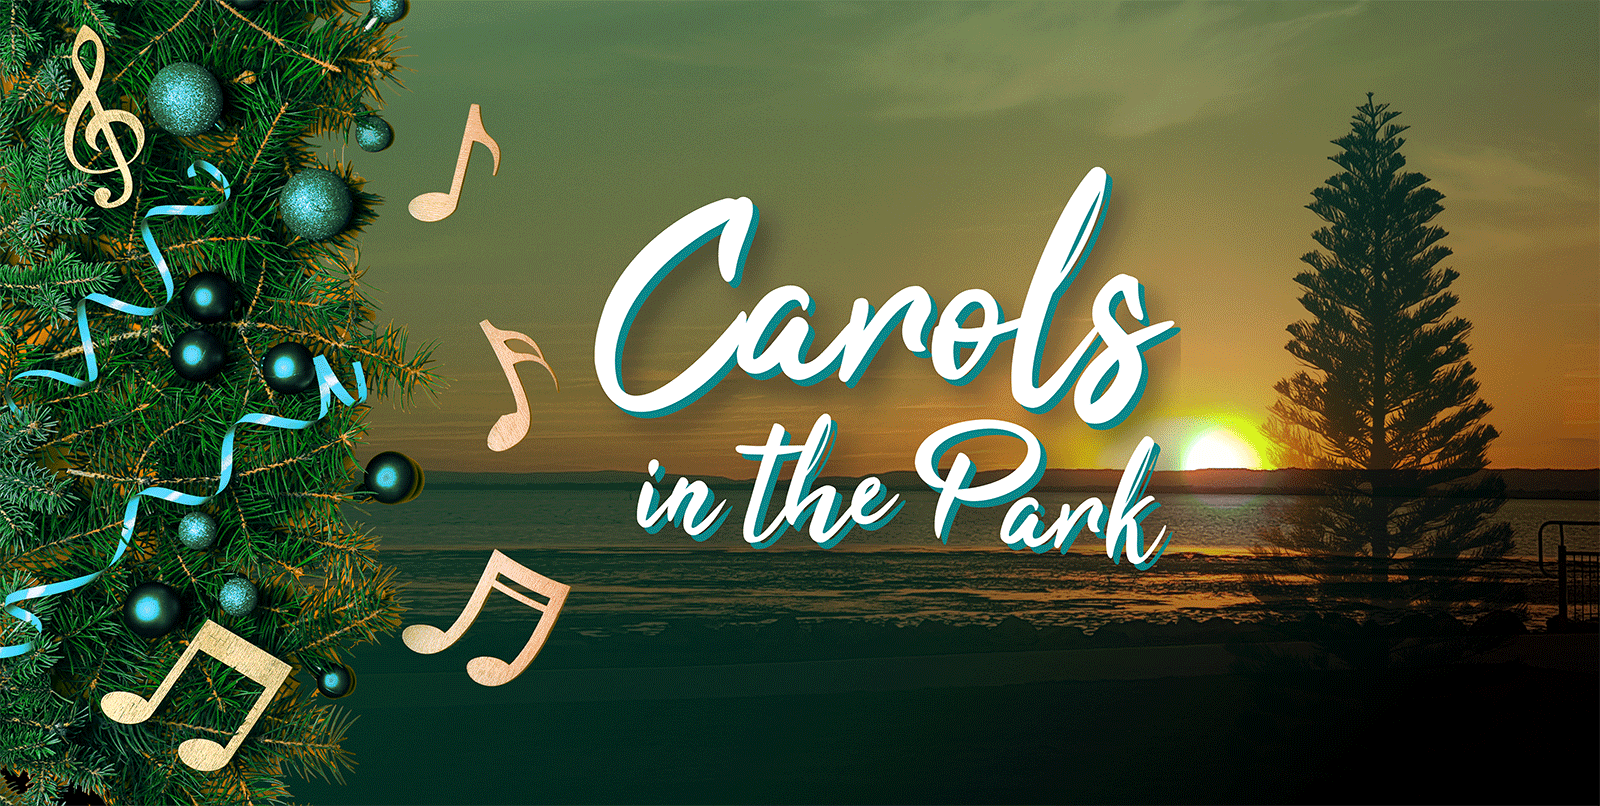 Carols-in-the-park-2021